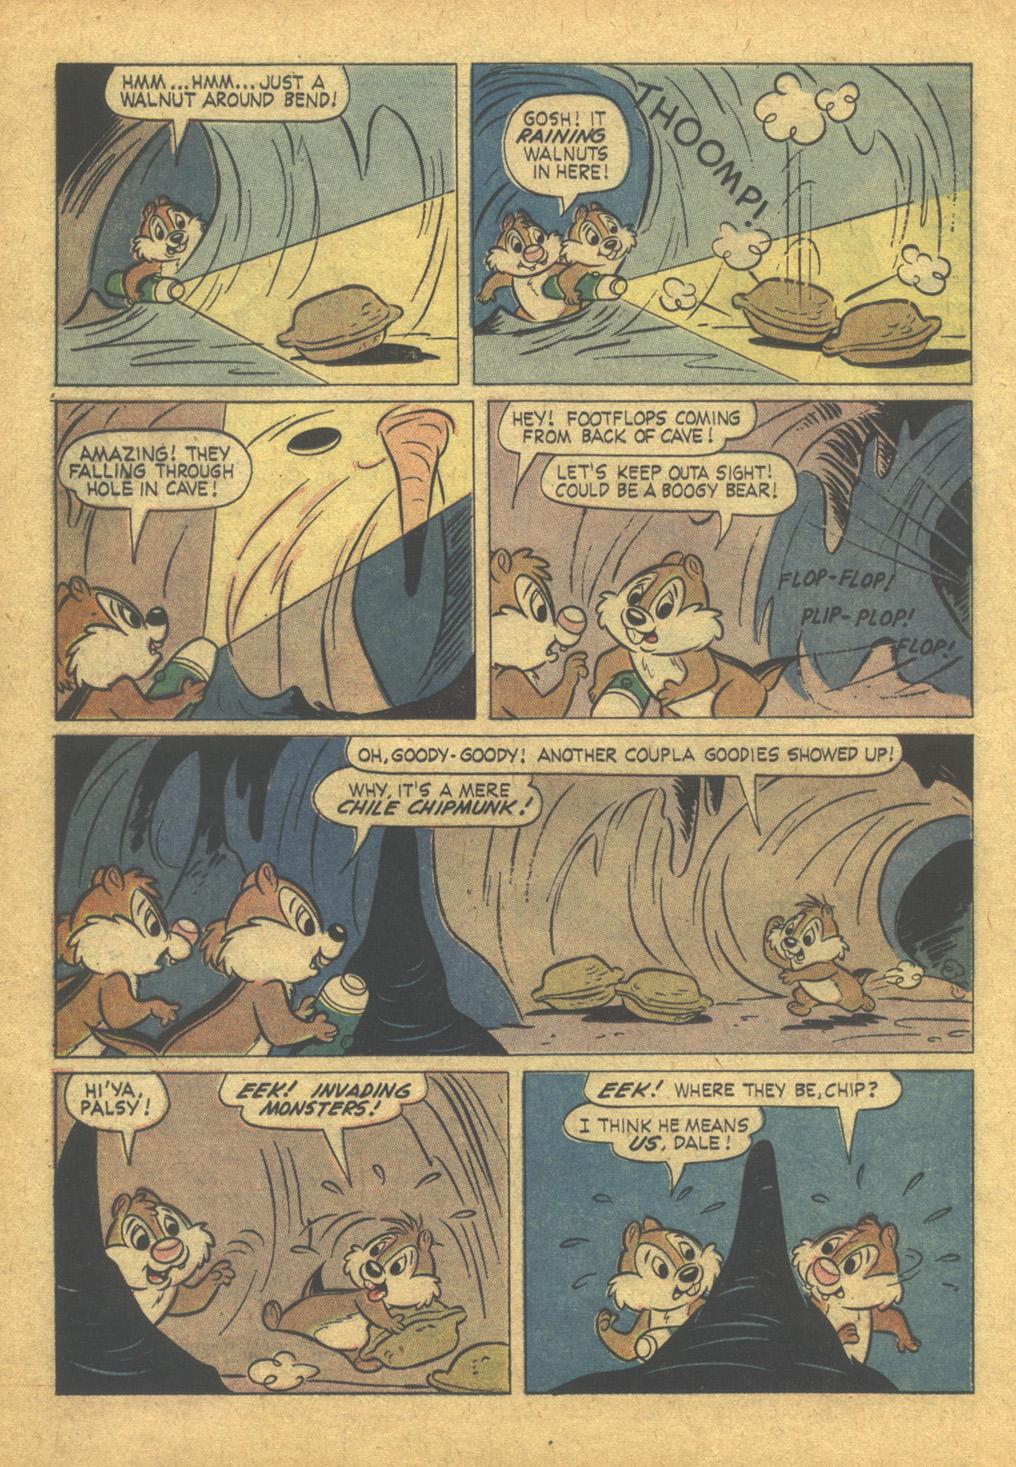 Walt Disneys Chip N Dale issue 26 - Page 26